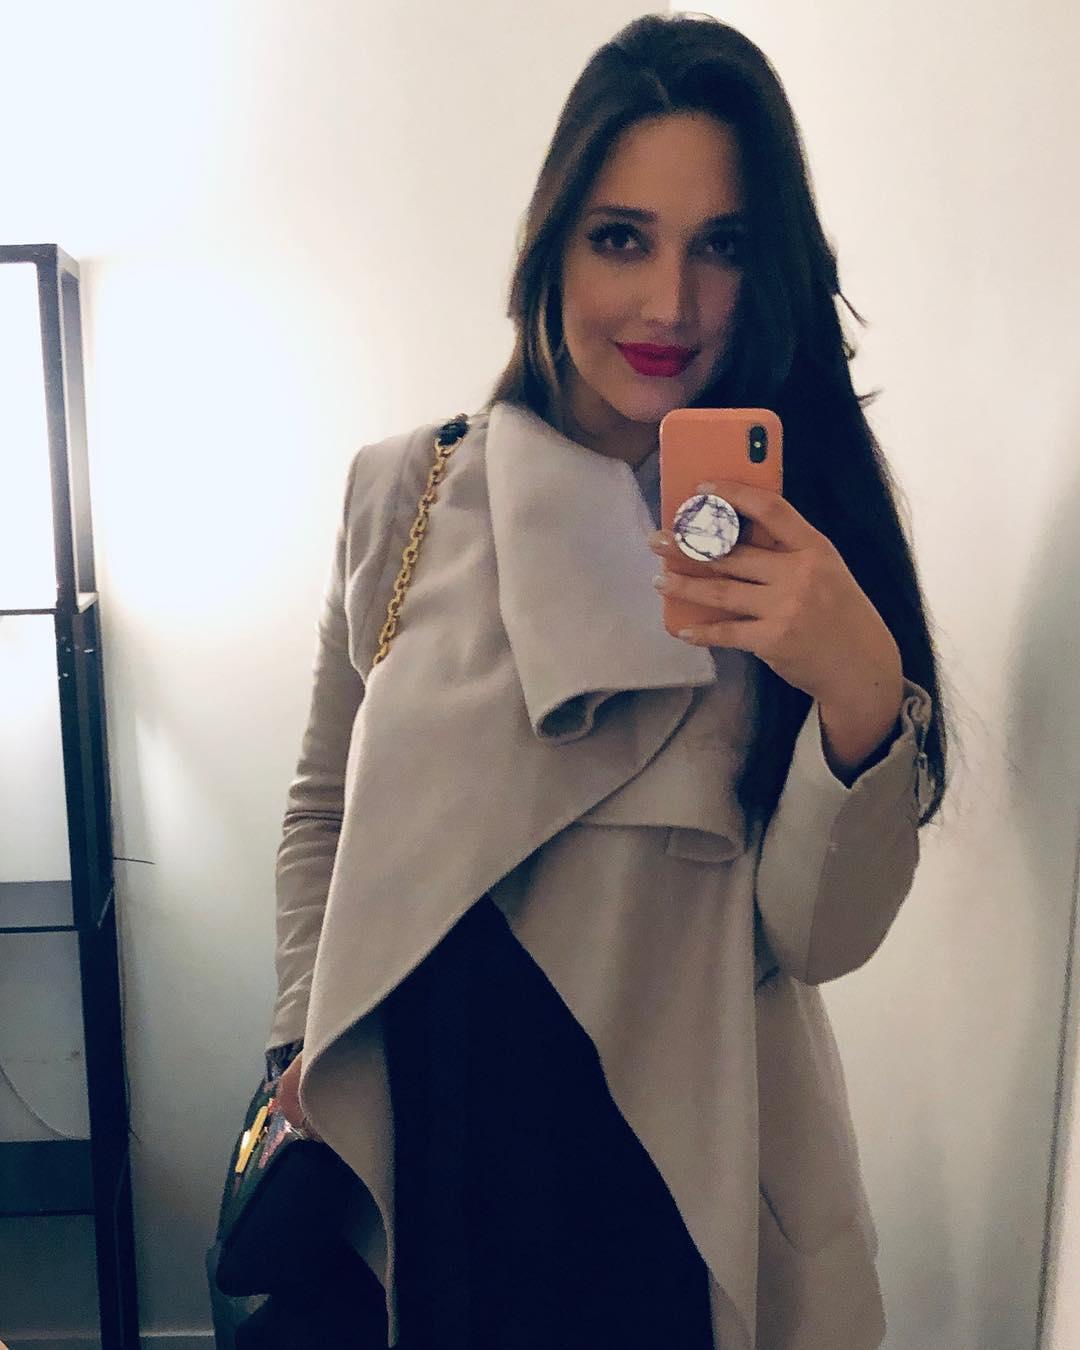 The Hottest Photos Of Amelia Vega - 12thBlog